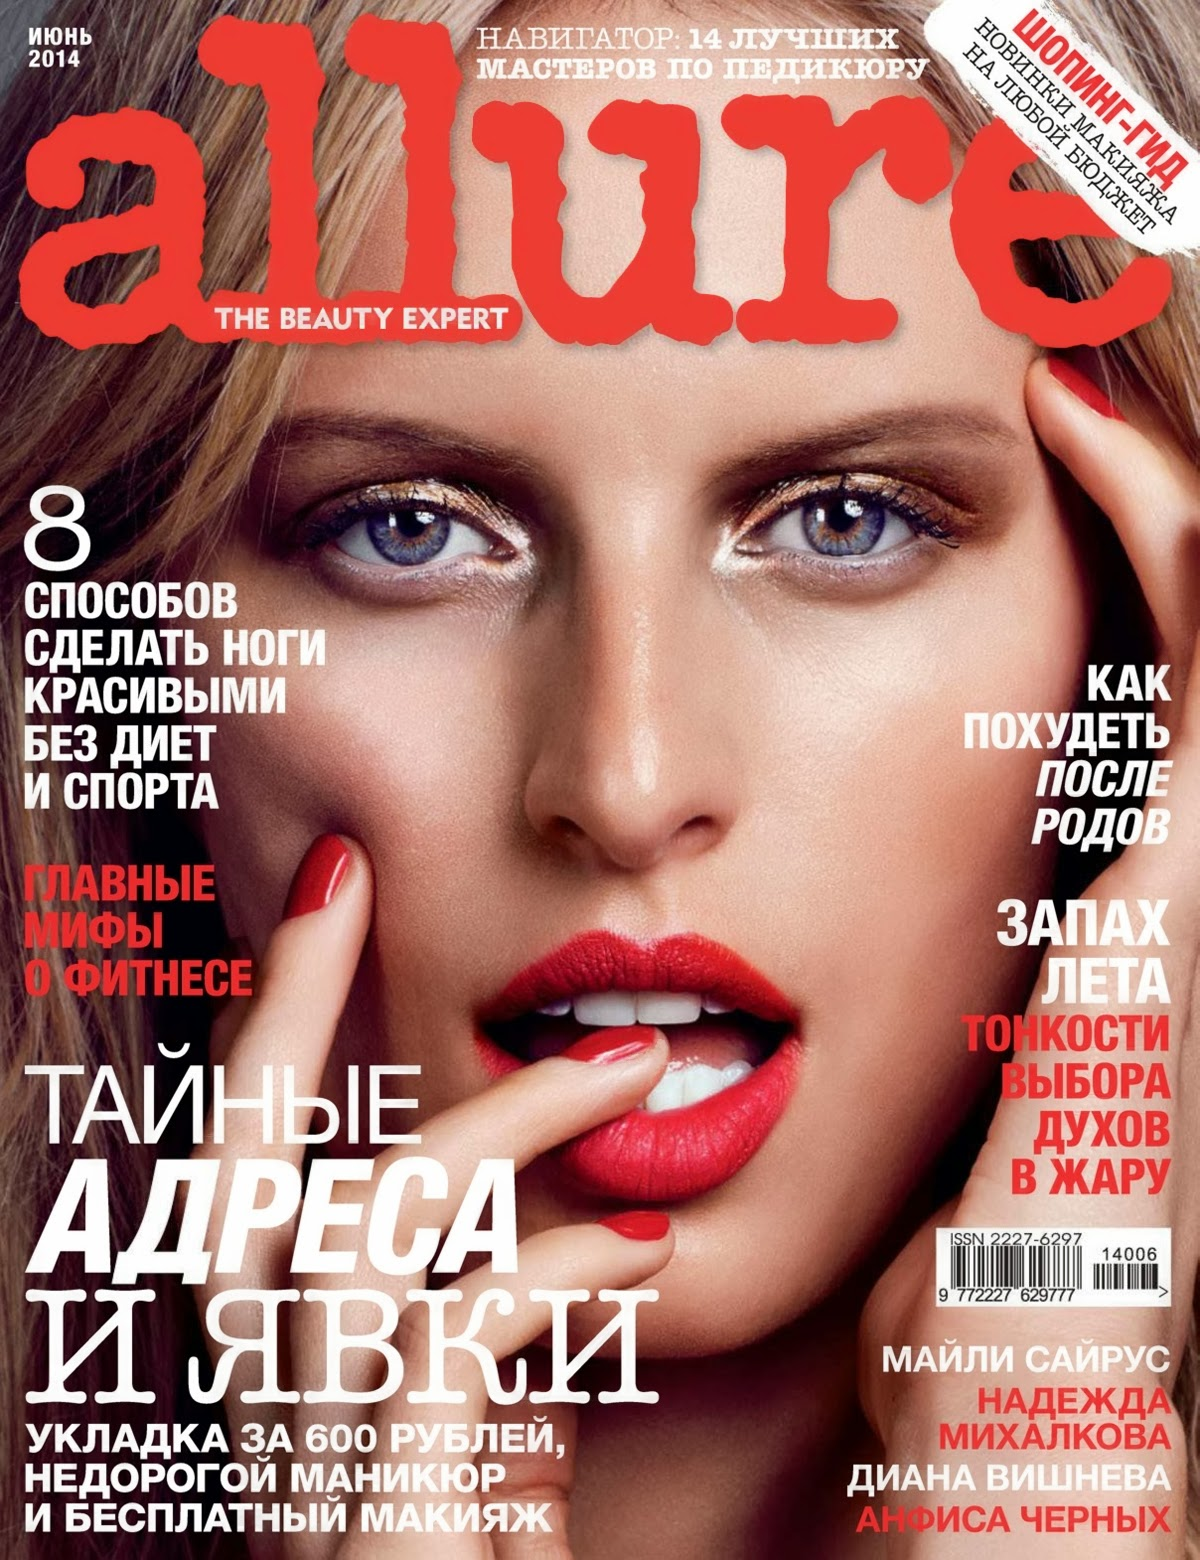 Karolina Kurkova 'Red Heat' Nicolas Moore for Allure Russia June 2014